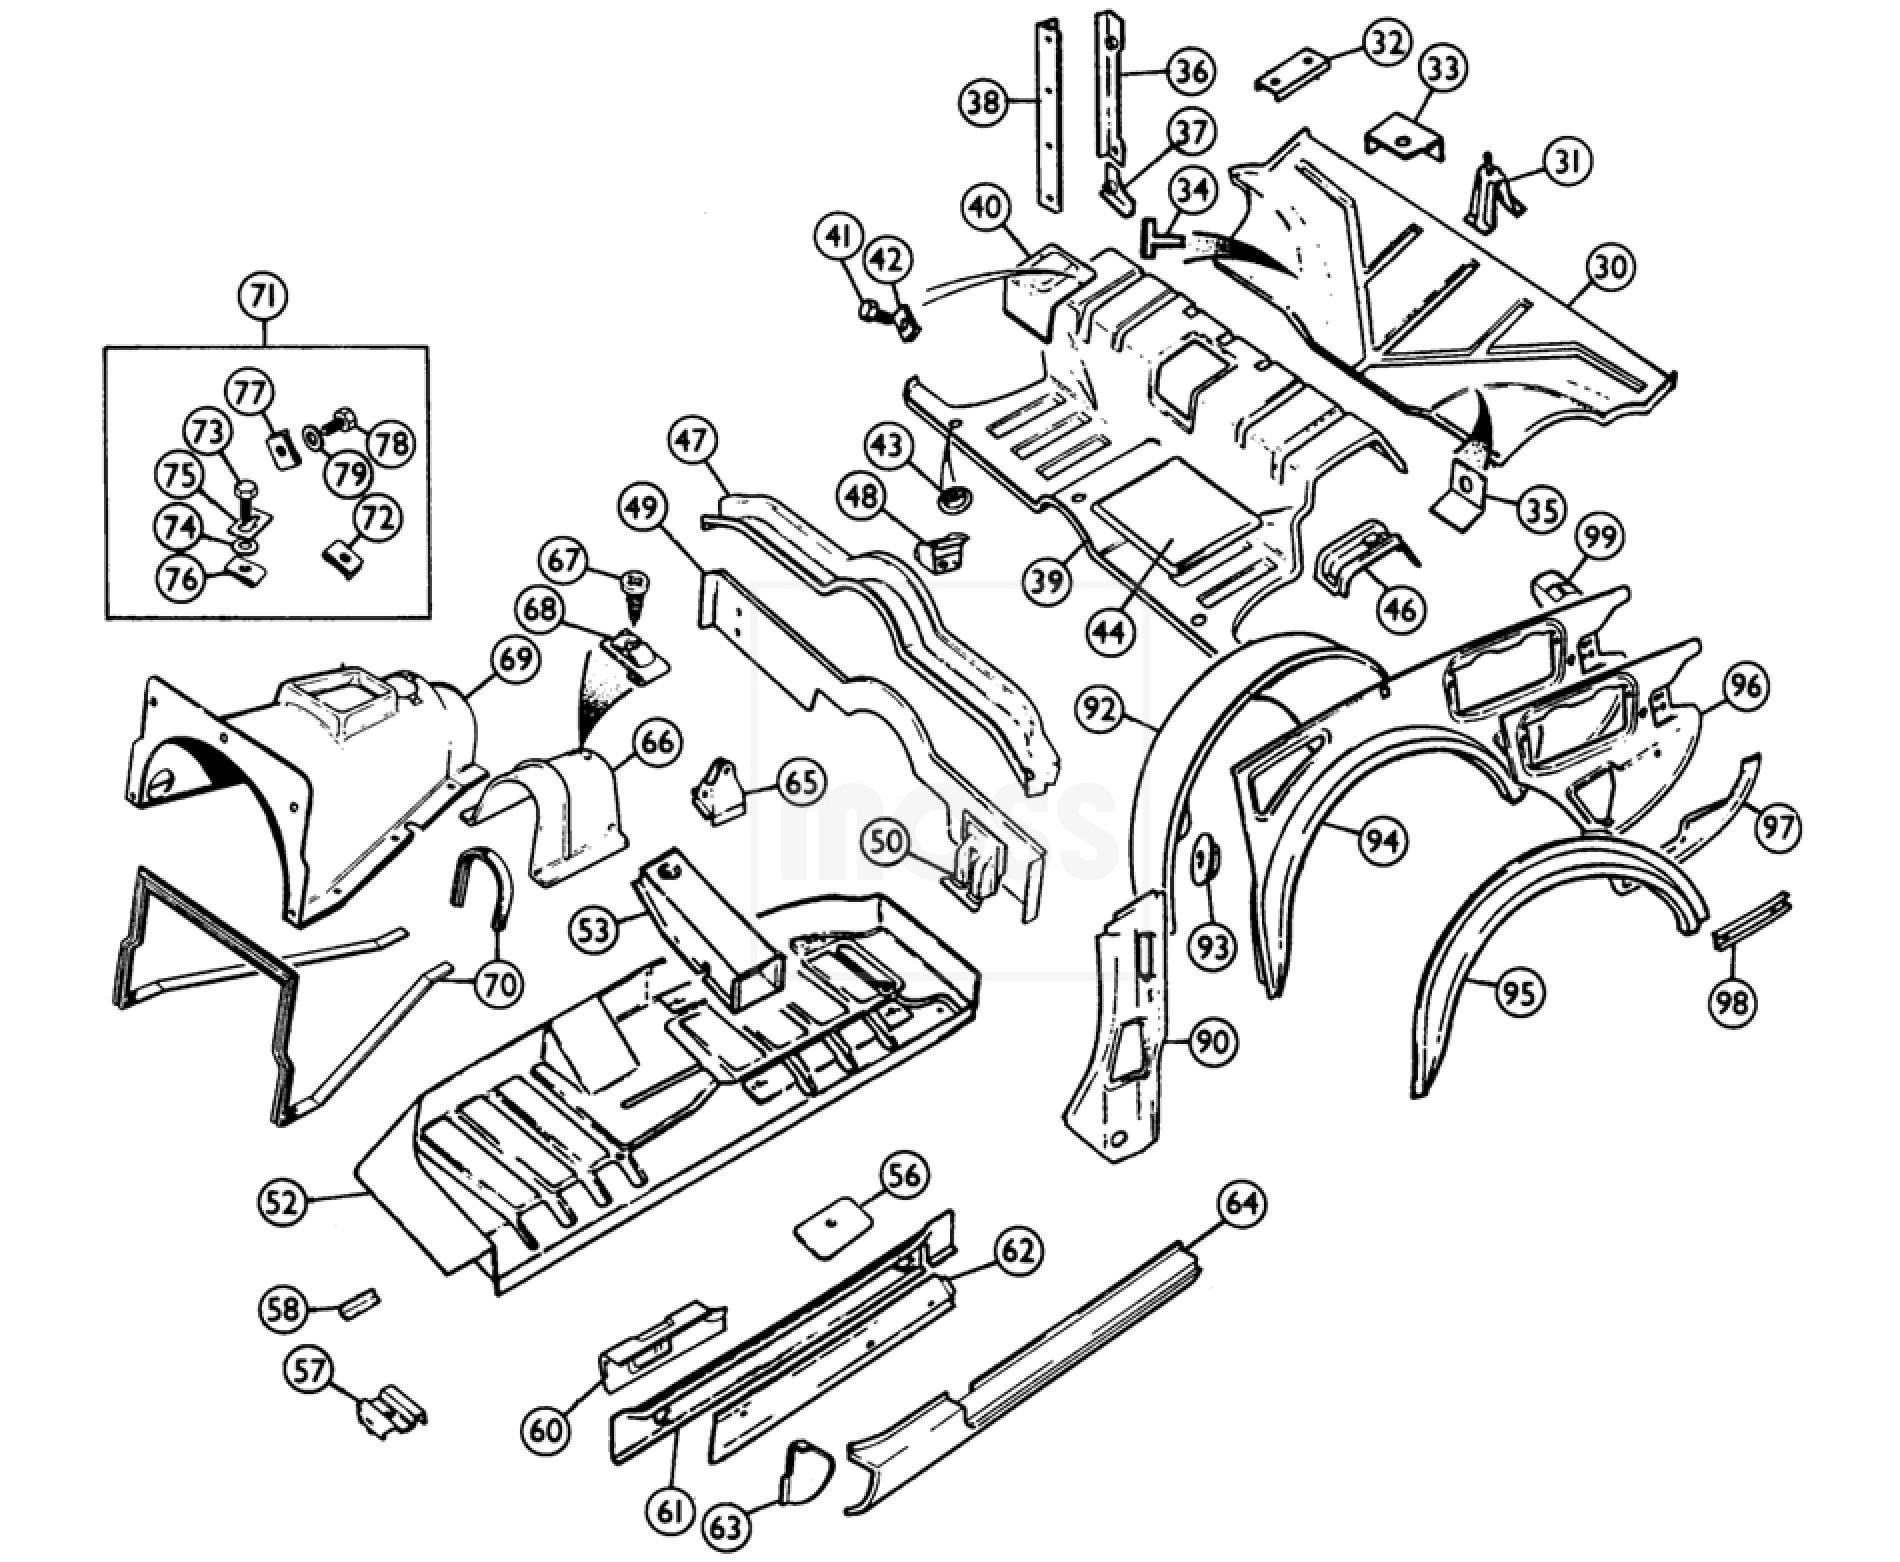 89 mercruiser ignition wiring diagram  diagram  auto